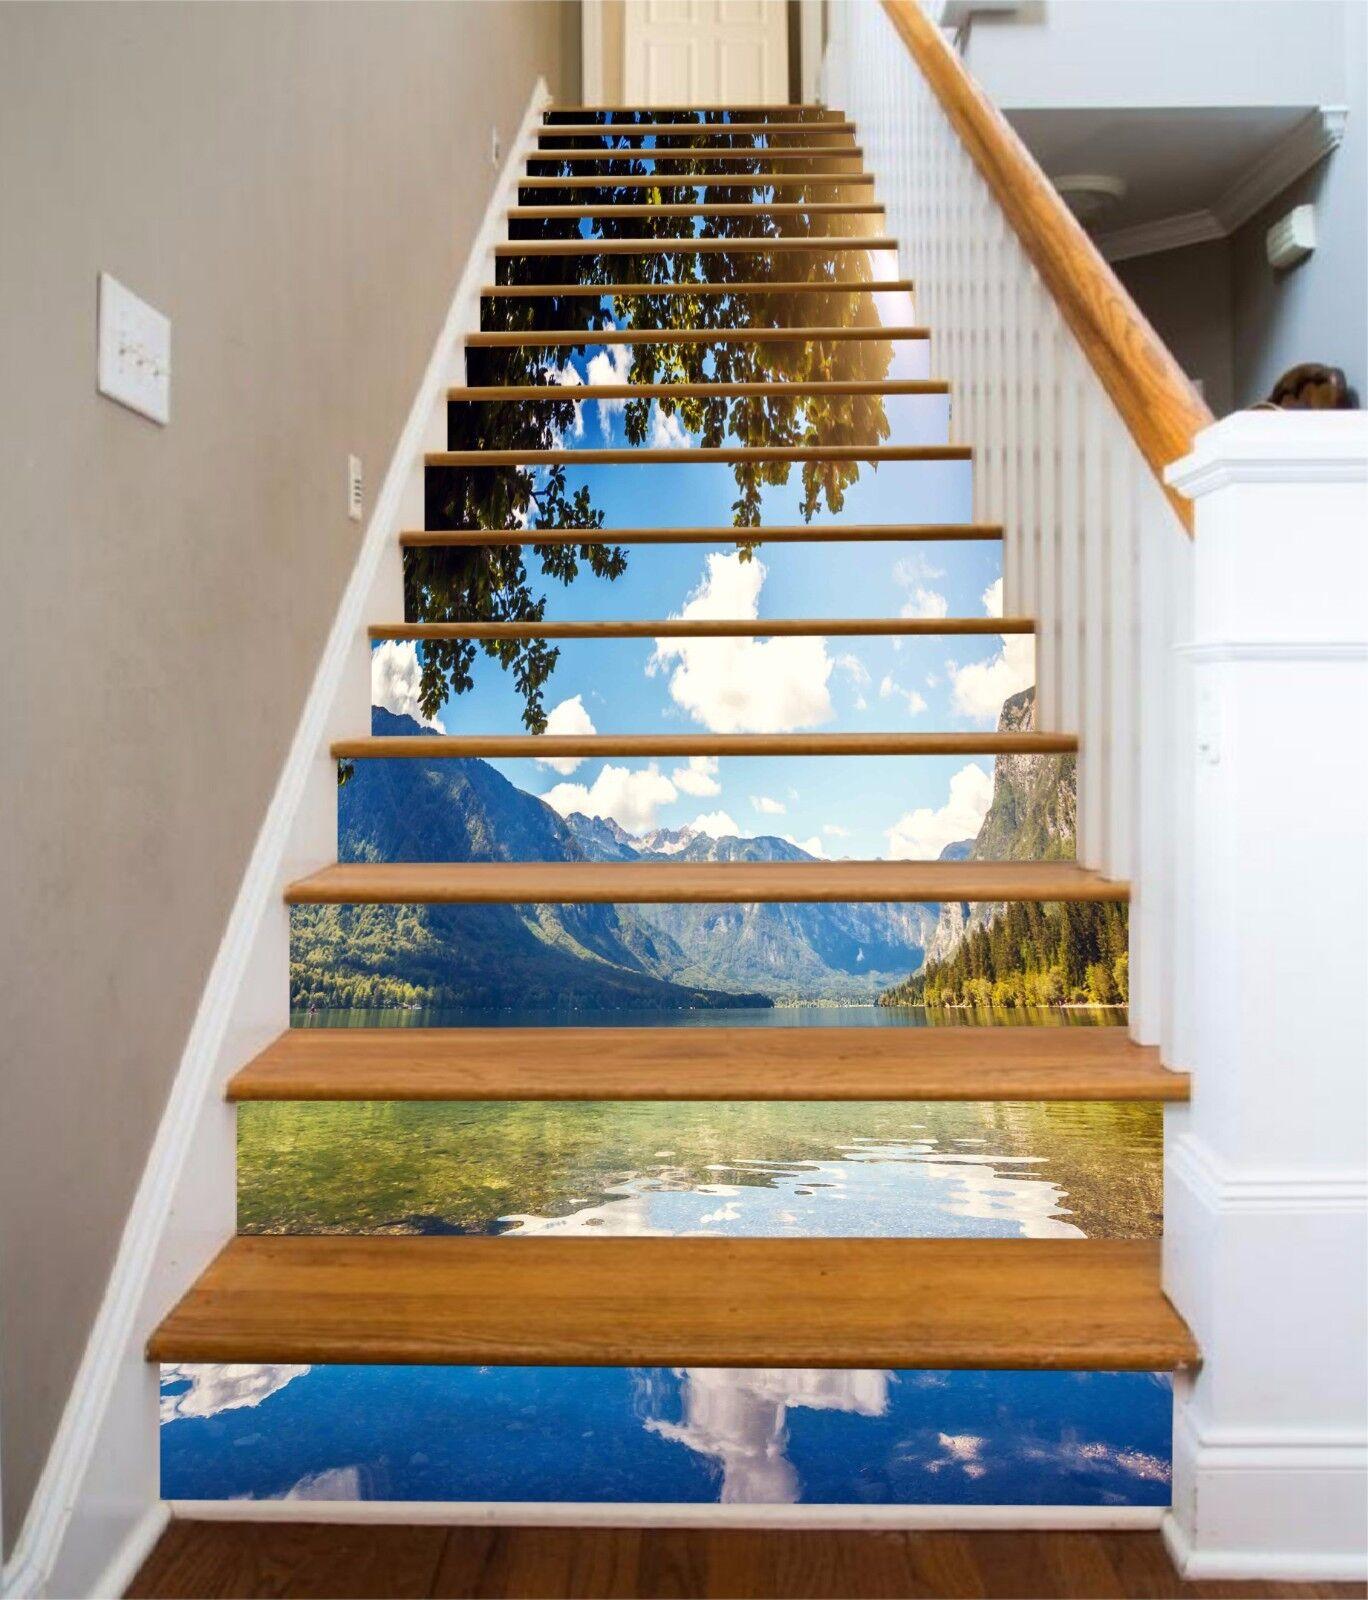 3D Pretty Lake 113 Stair Risers Decoration Photo Mural Vinyl Decal Wallpaper AU